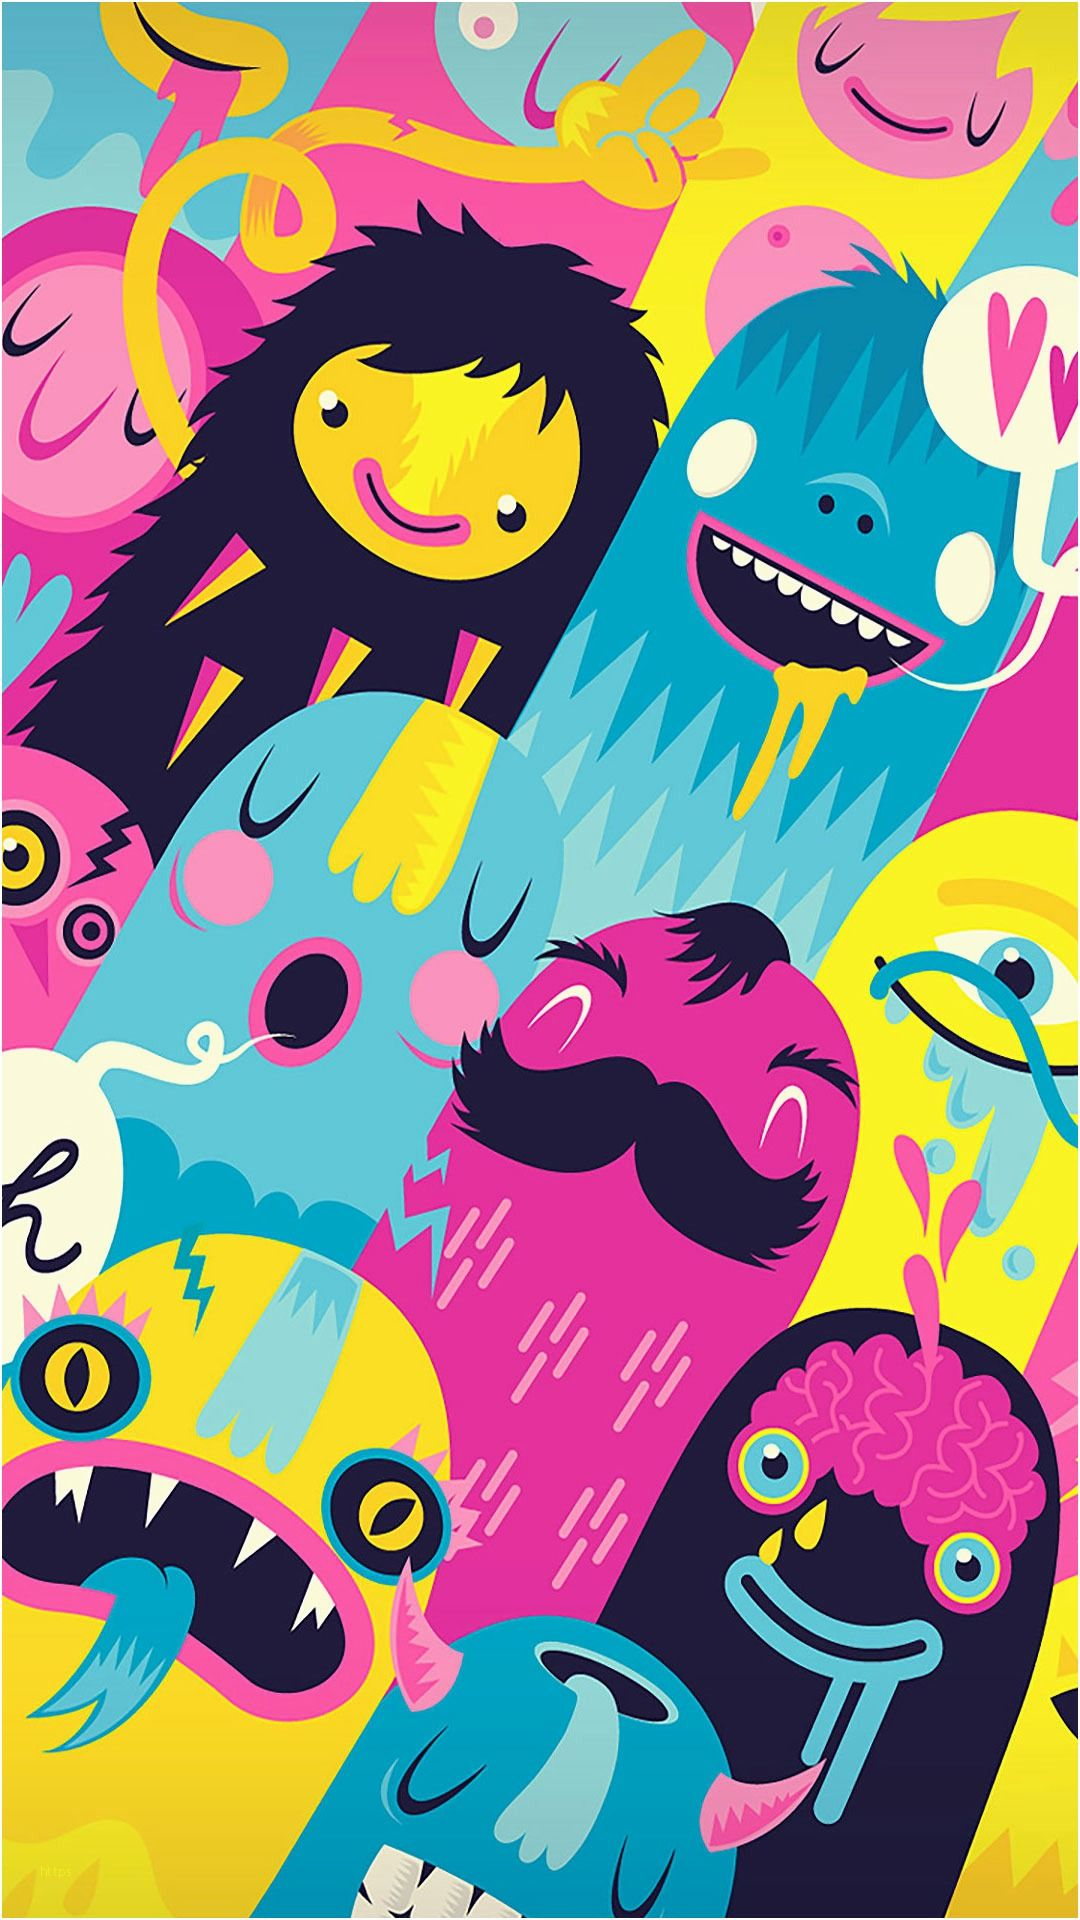 Positive cool phone wallpaper